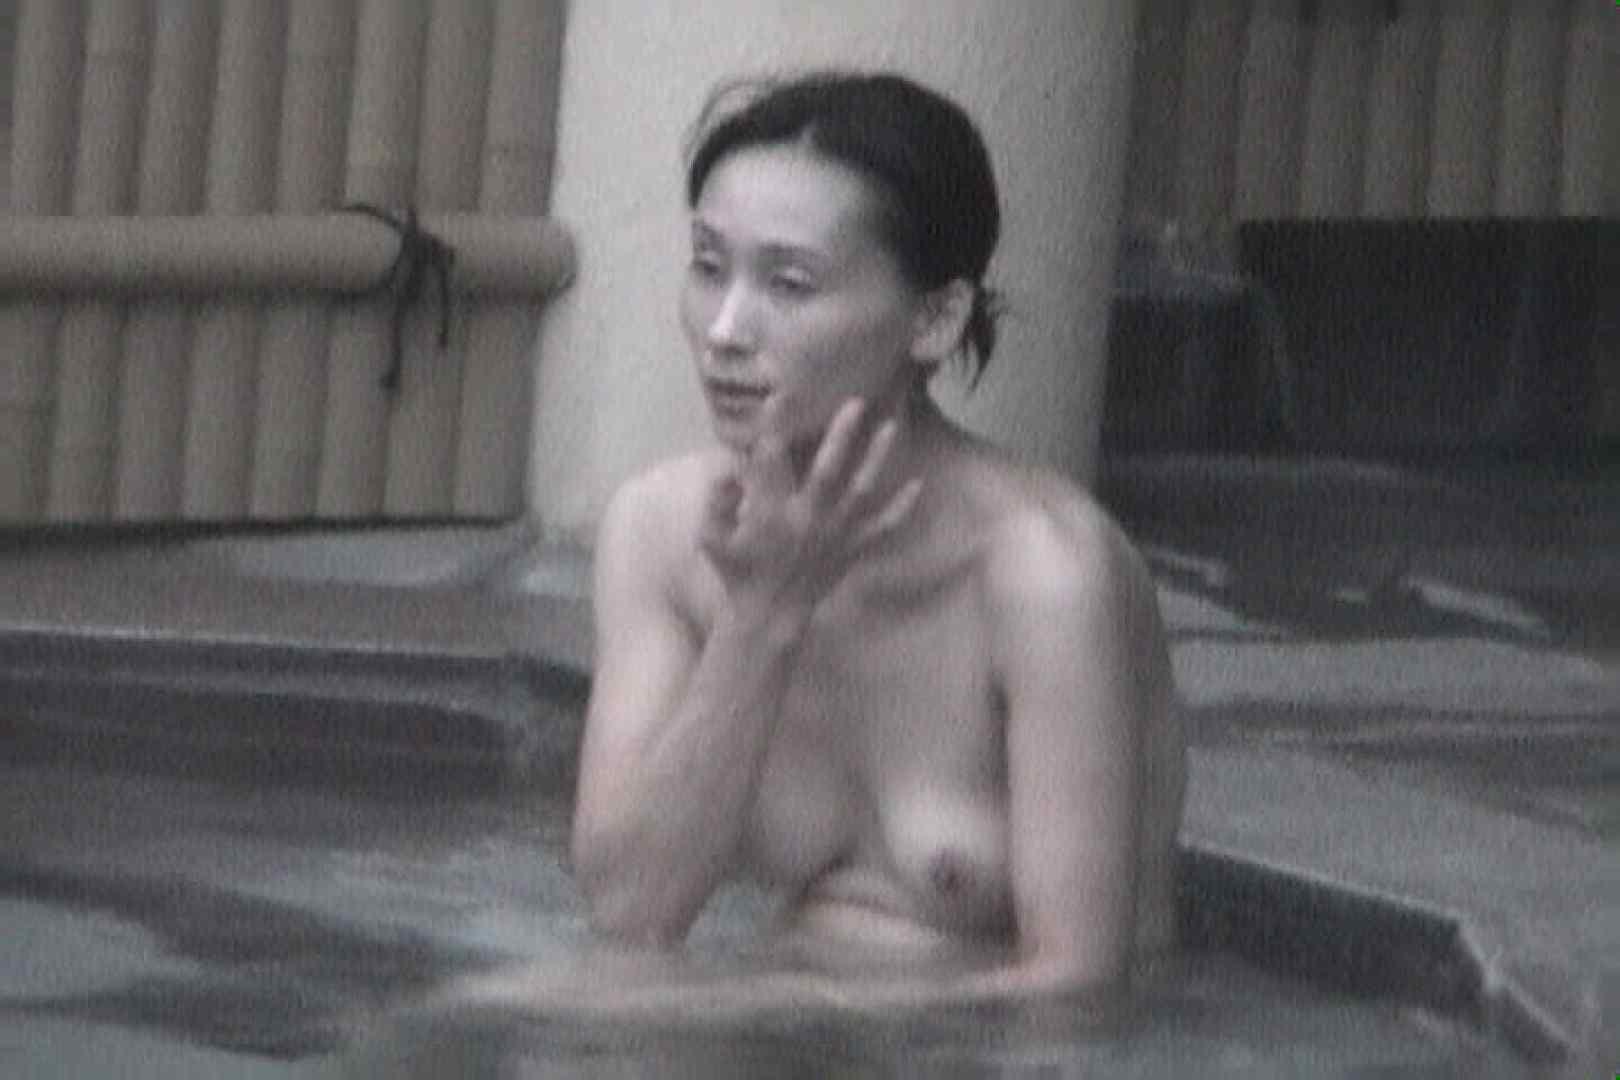 Aquaな露天風呂Vol.557 女体盗撮 盗撮ワレメ無修正動画無料 40連発 38